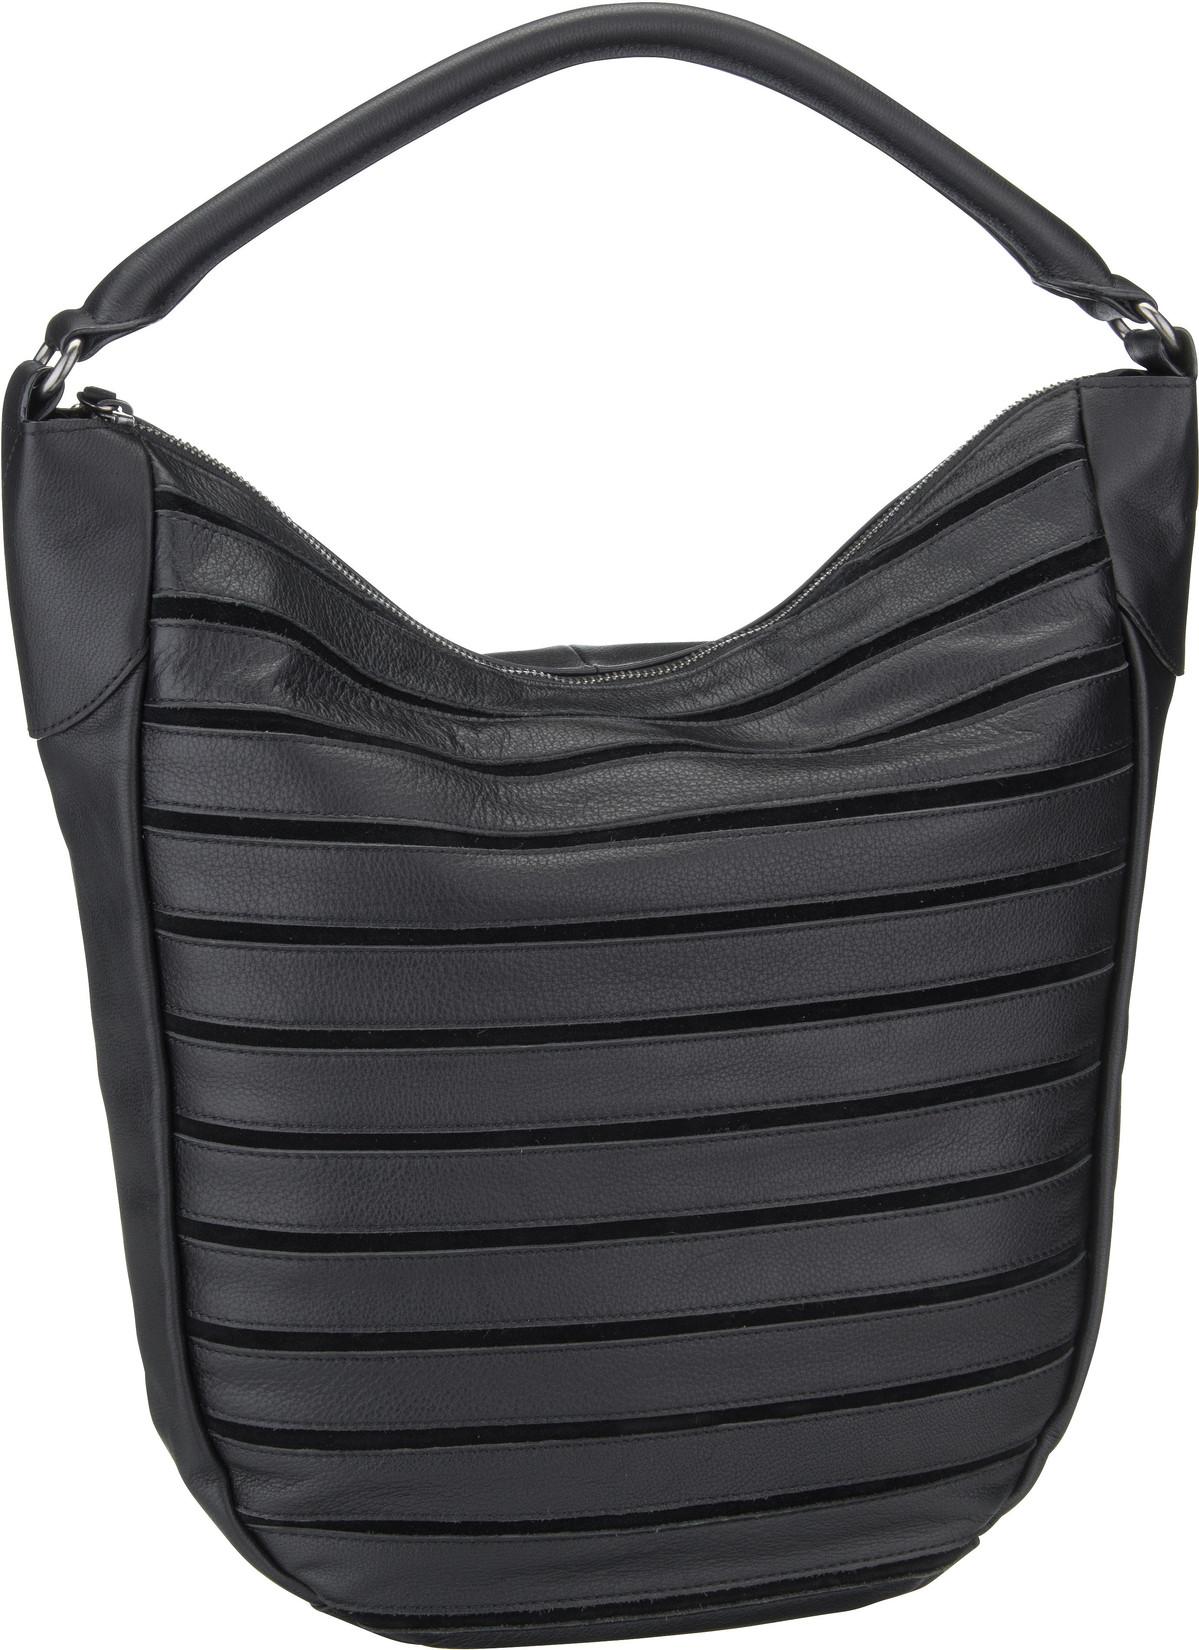 Handtasche Picnic Black